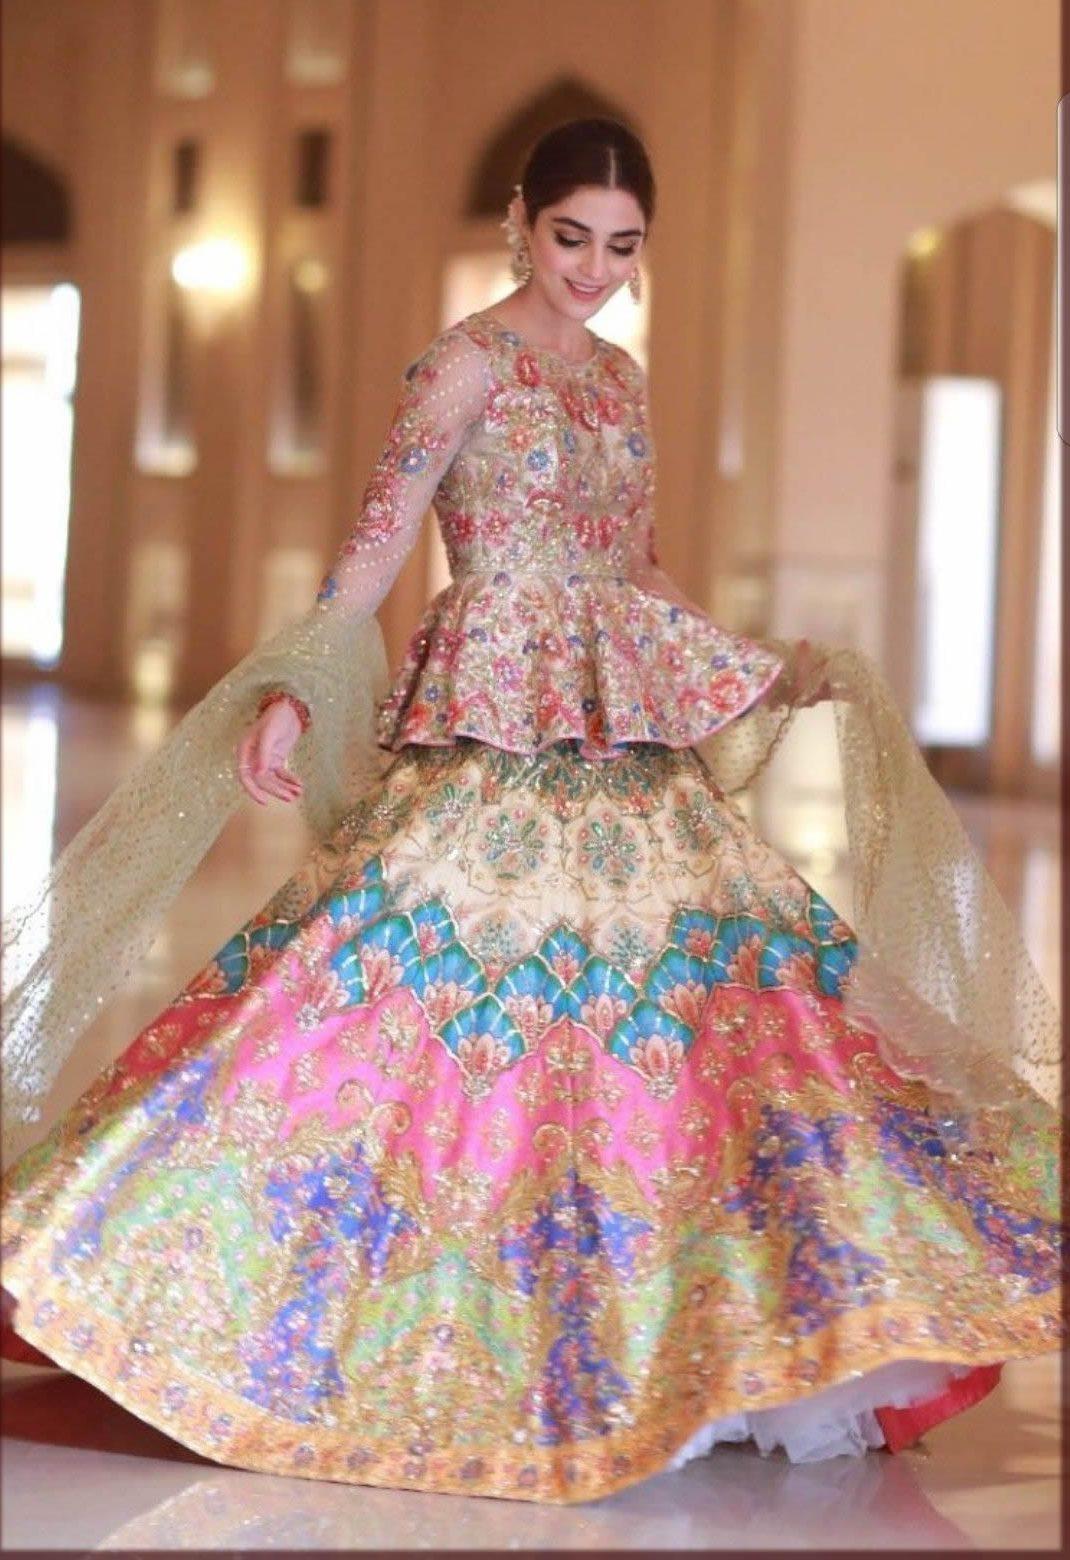 maya ali wearing nomi ansari dress